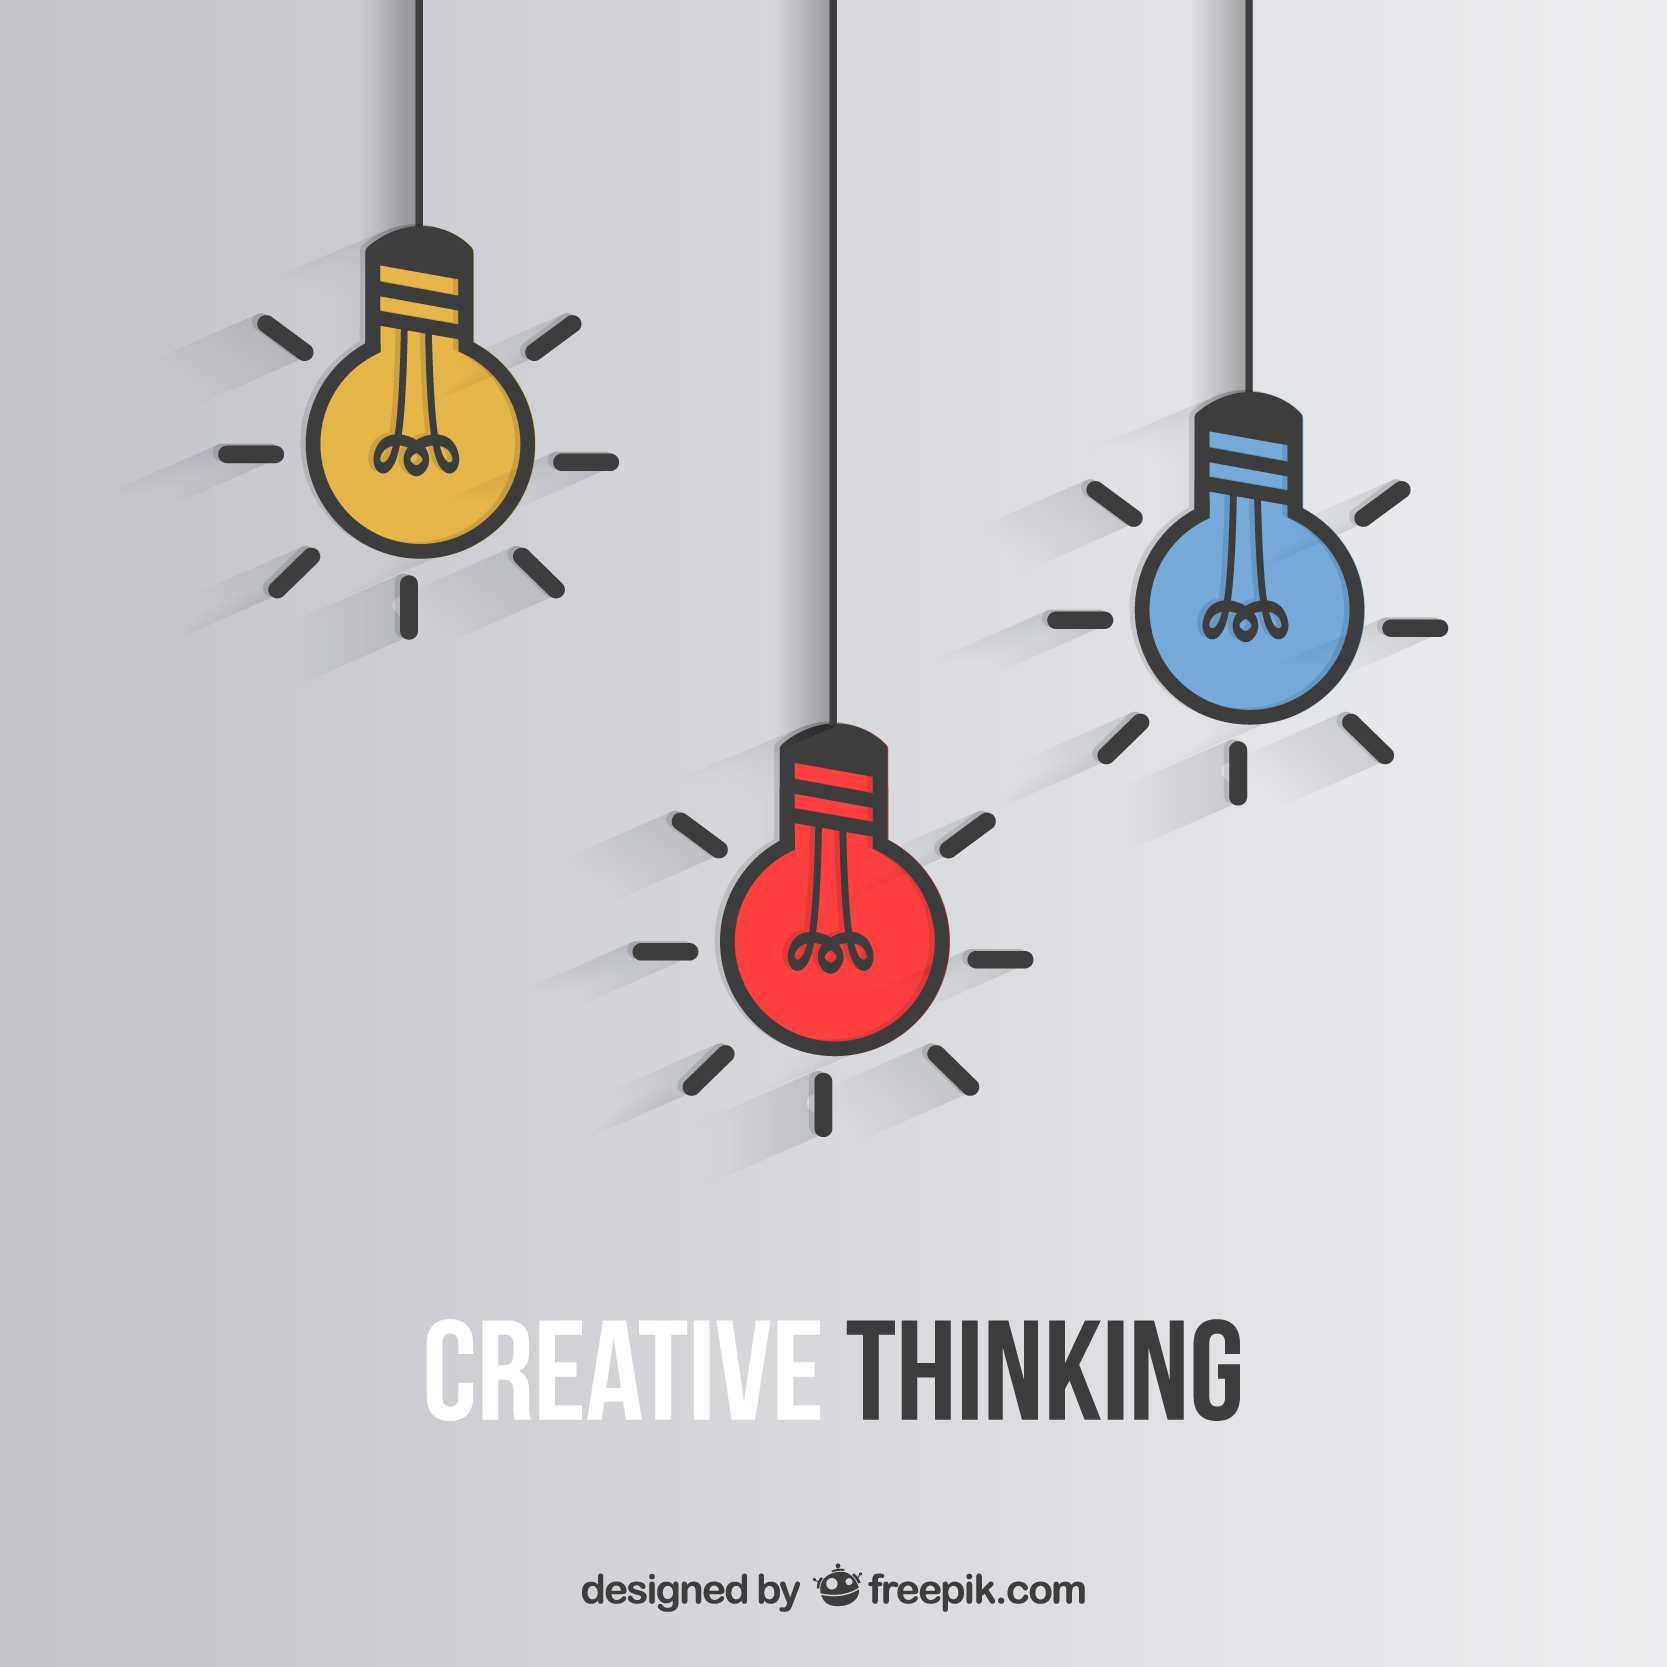 Imajinasi, Sumberdaya Kreasi dan Inovasi - Kompasiana.com